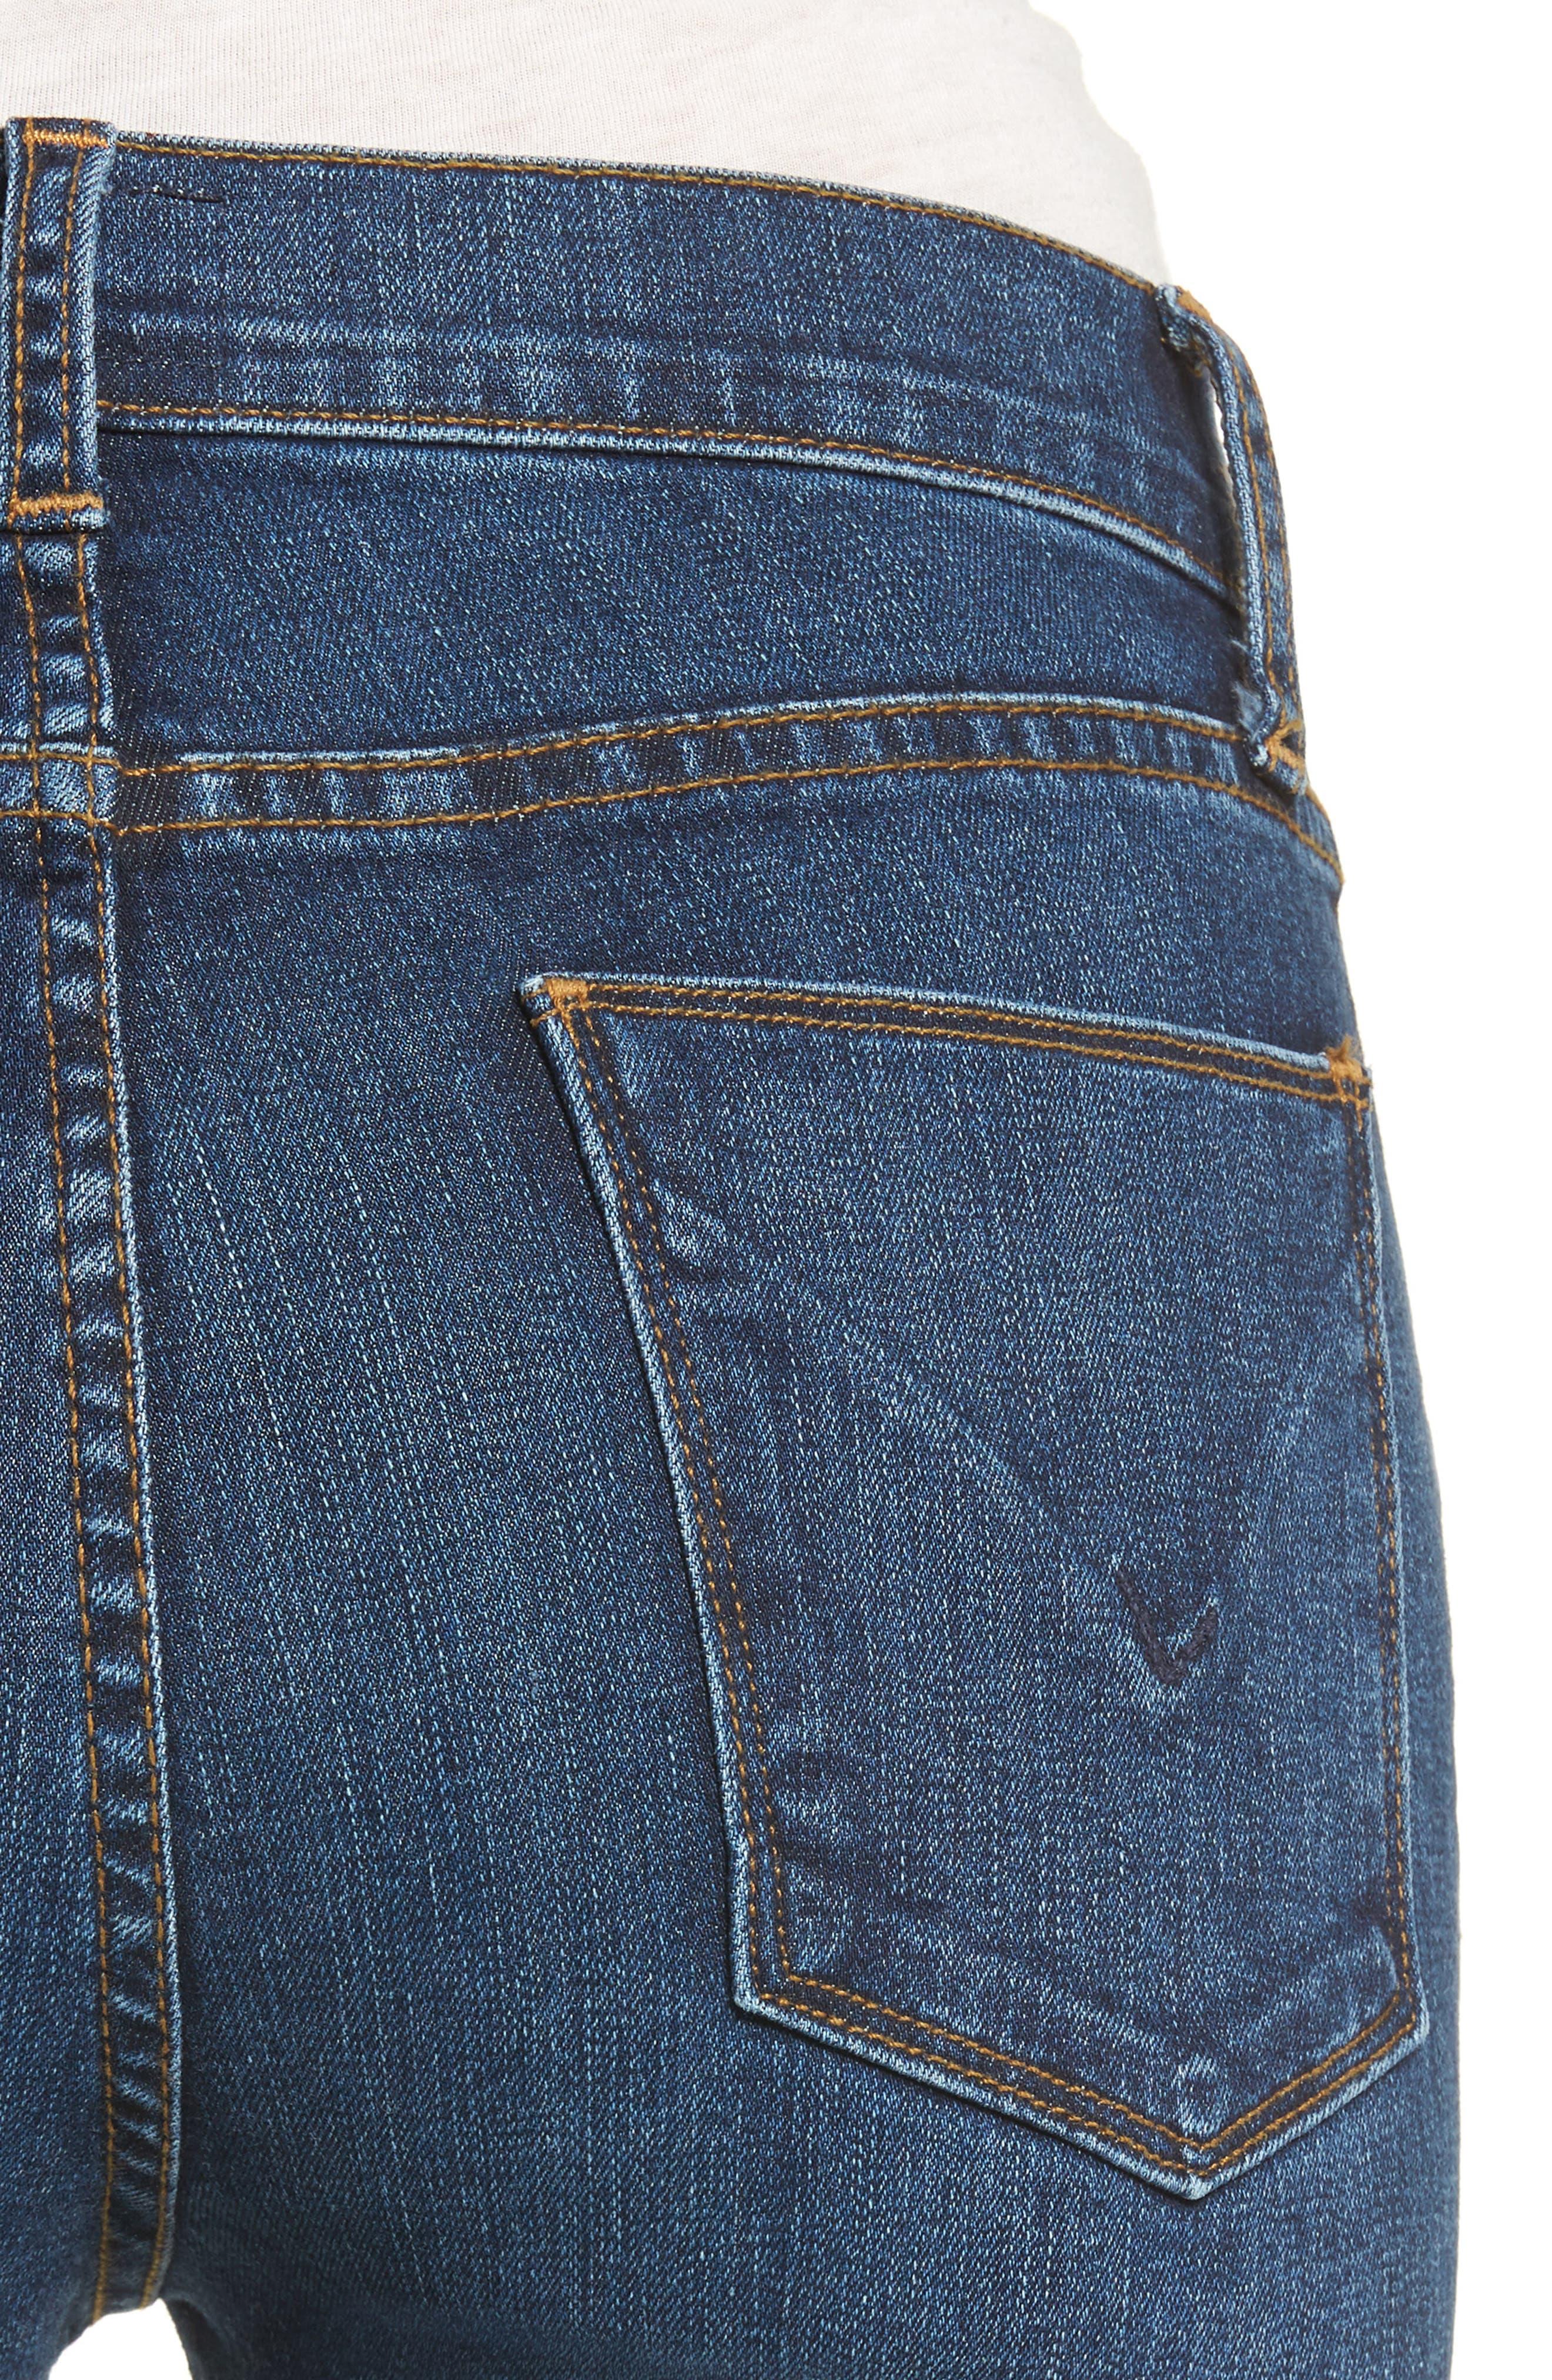 Barbara High Waist Super Skinny Jeans,                             Alternate thumbnail 4, color,                             Fatal